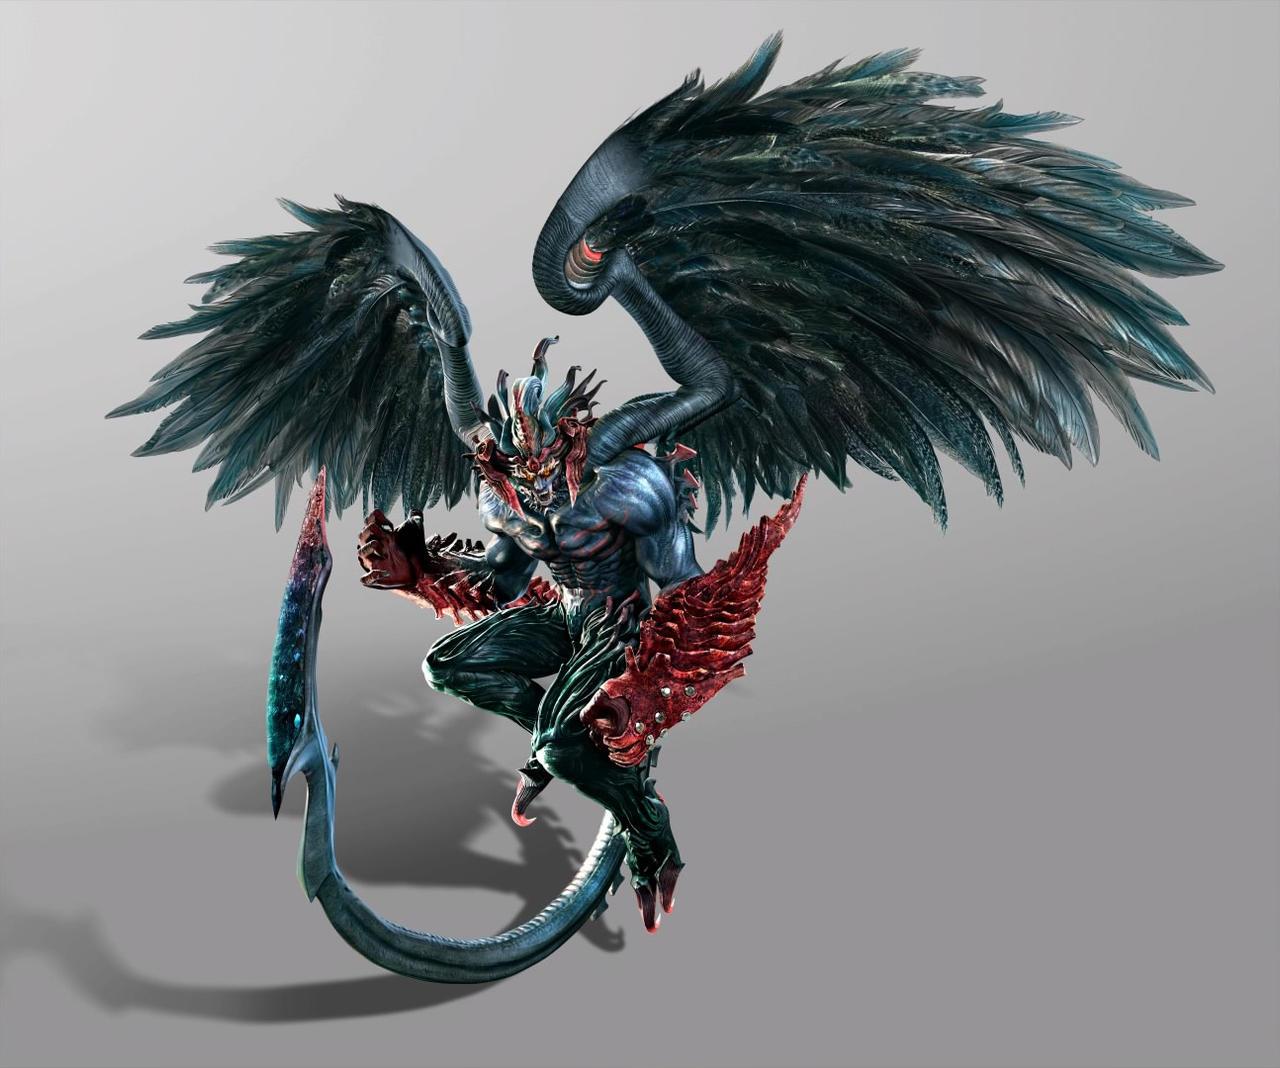 Devil Jin Blood Vengeance By Yoshi Lee On Deviantart